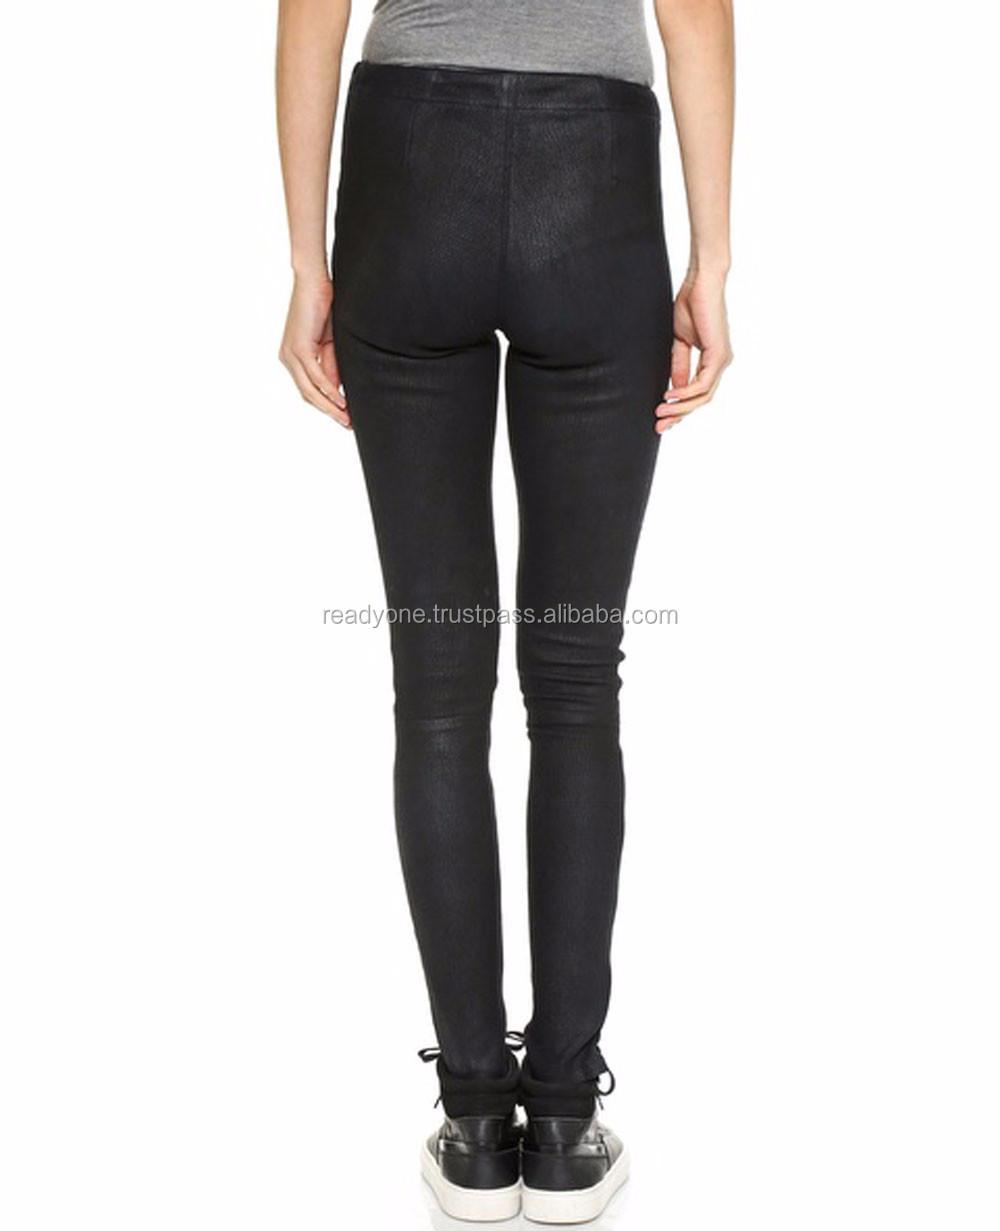 b01012598c7e88 Girls Black Faux Leather Gothic Legging Women Plus Size High waist Legging